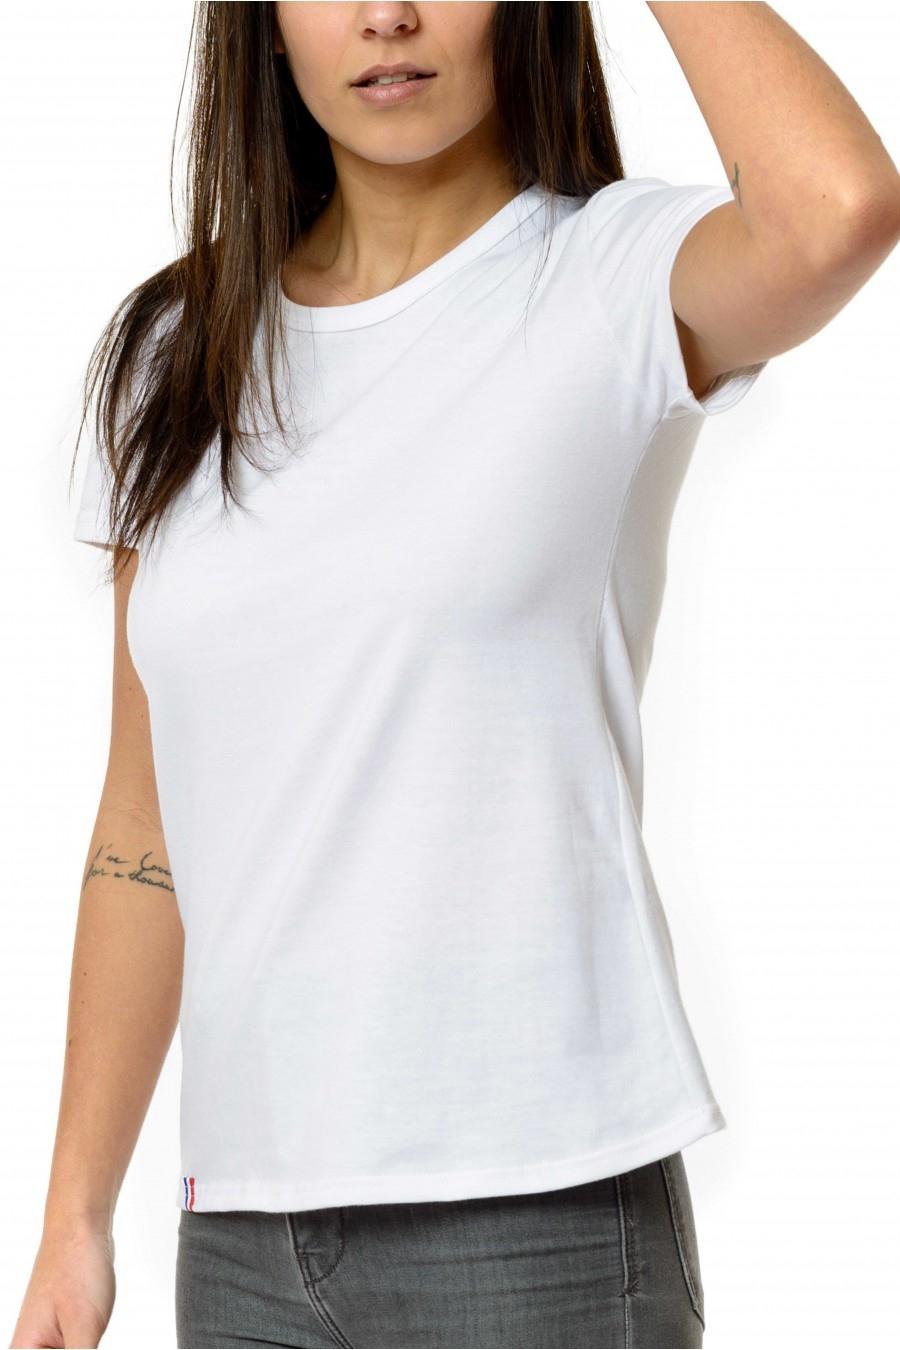 fe40464c067 Tee shirt Femme Uni Blanc - 100% Made in France - 100% Coton Bio